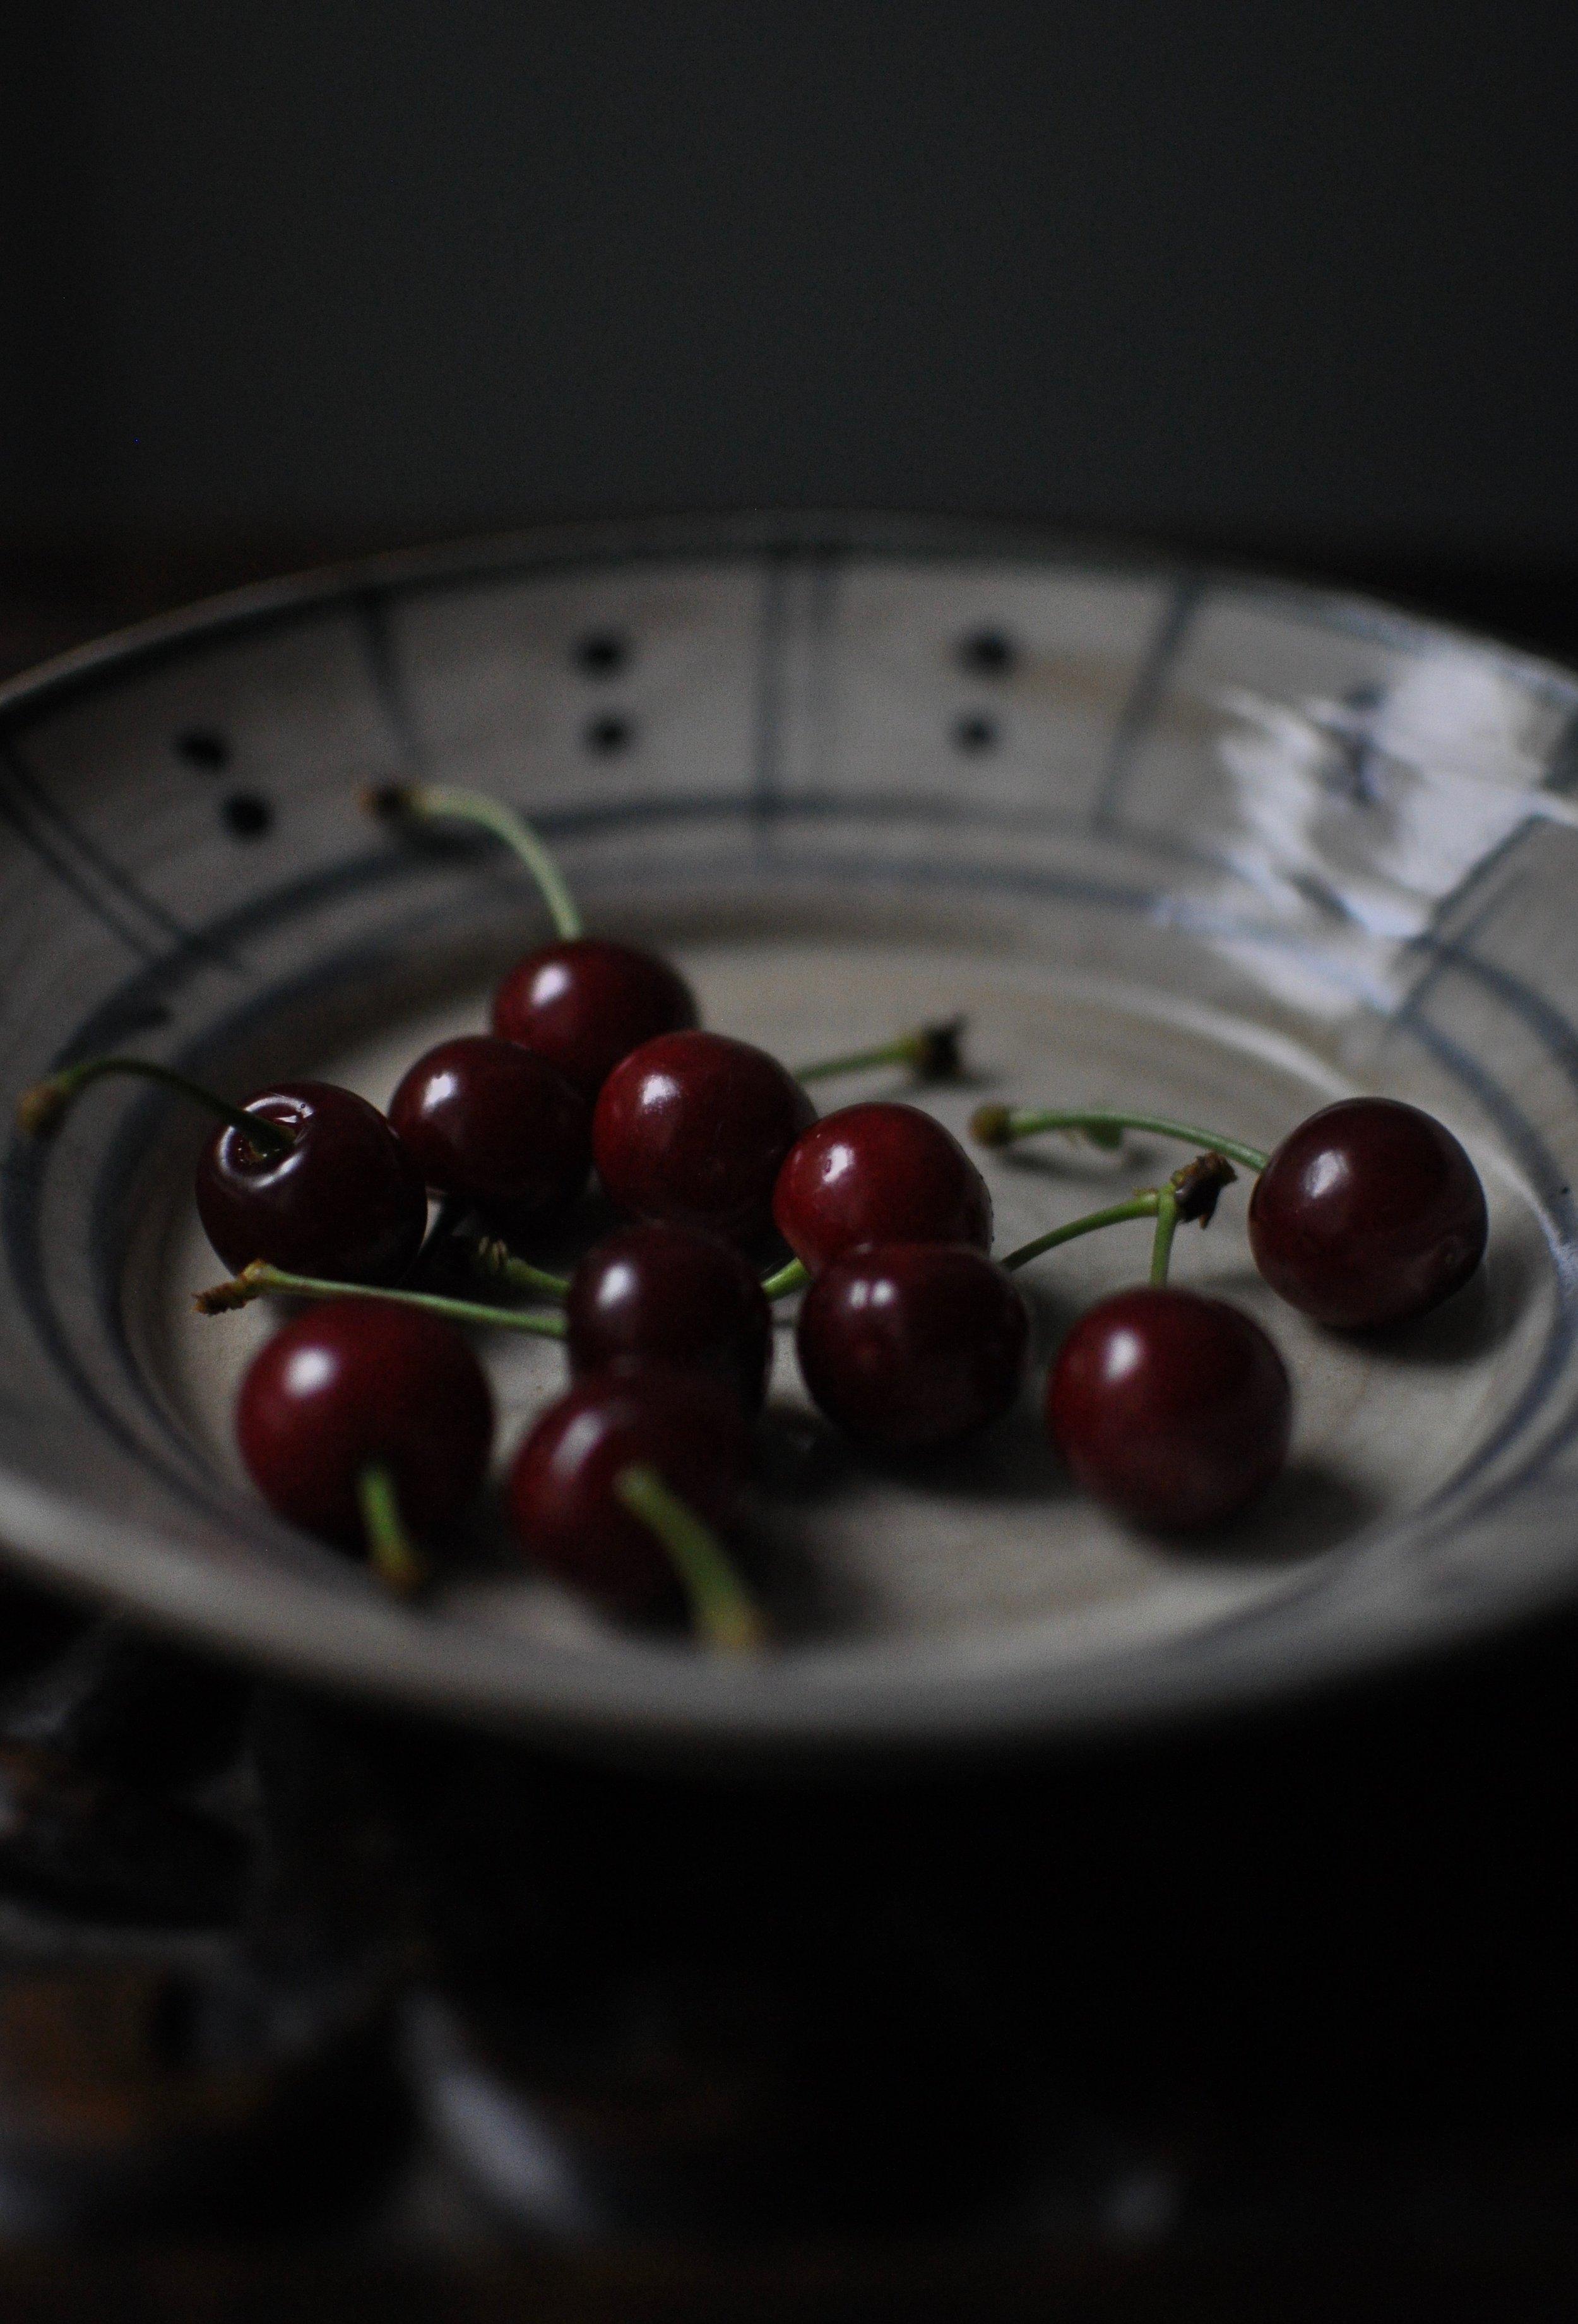 EMOSIWN First Crop Cherry Lreddsc_1434.JPG